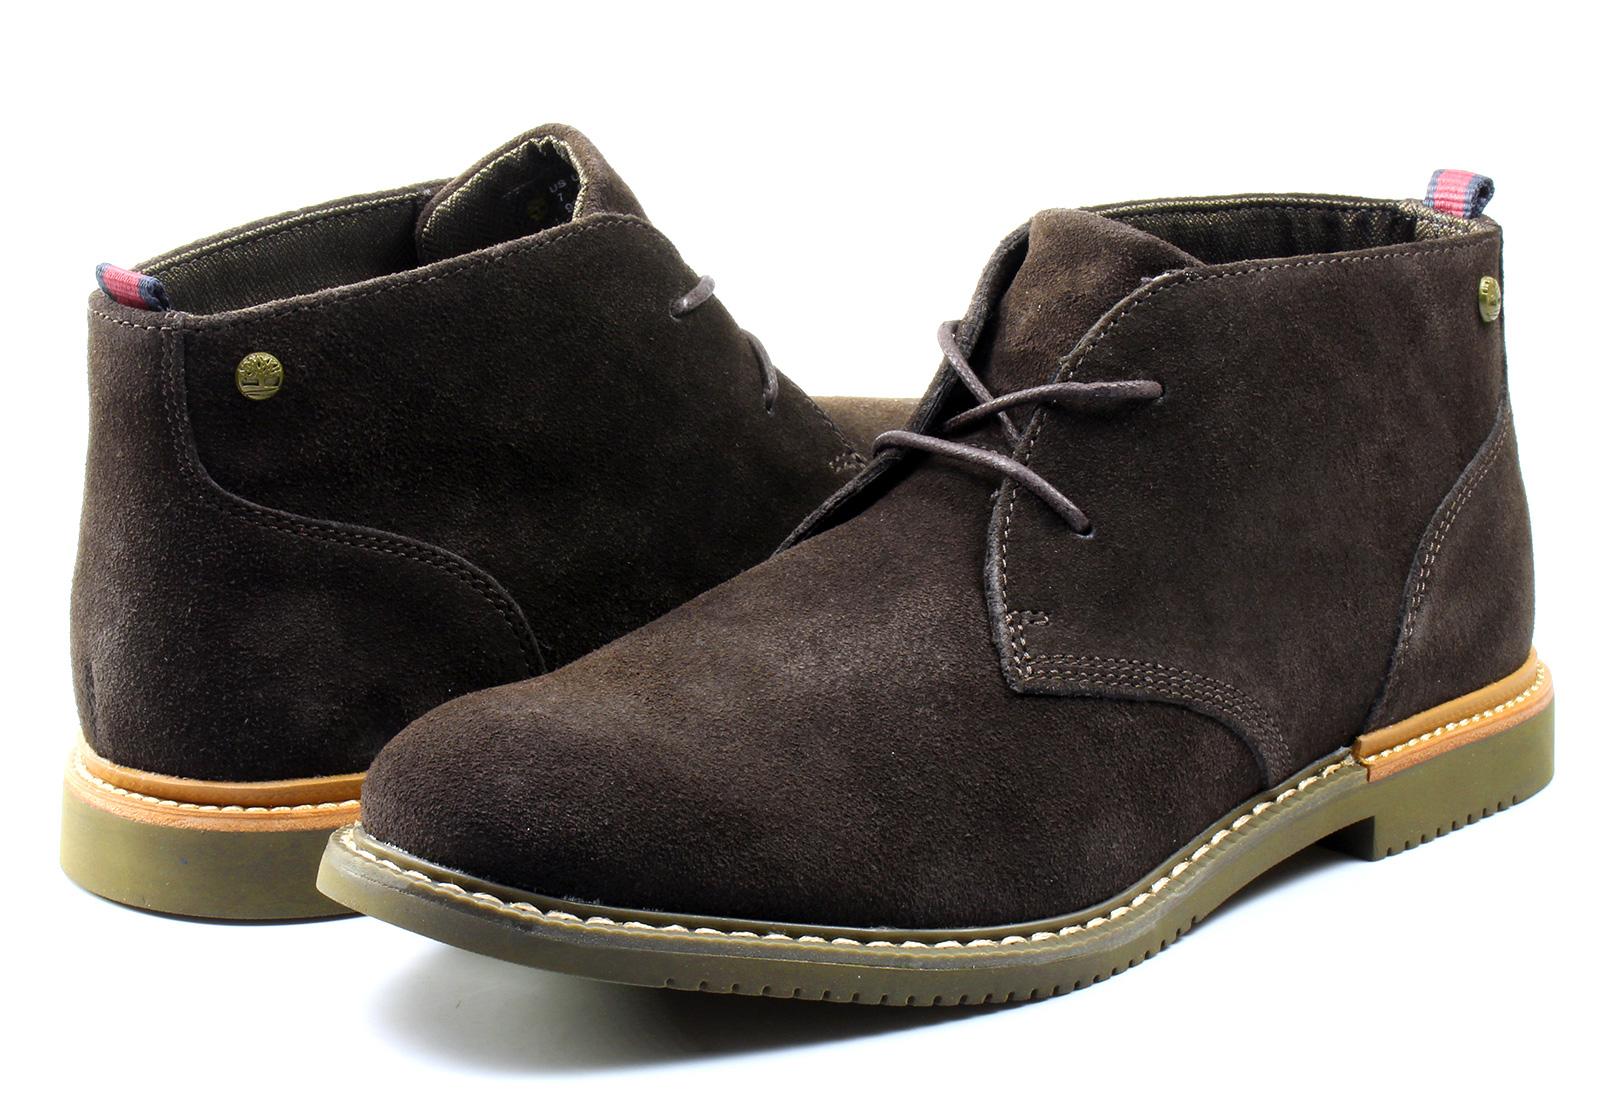 timberland shoes brookpark chukka 9248b dbr